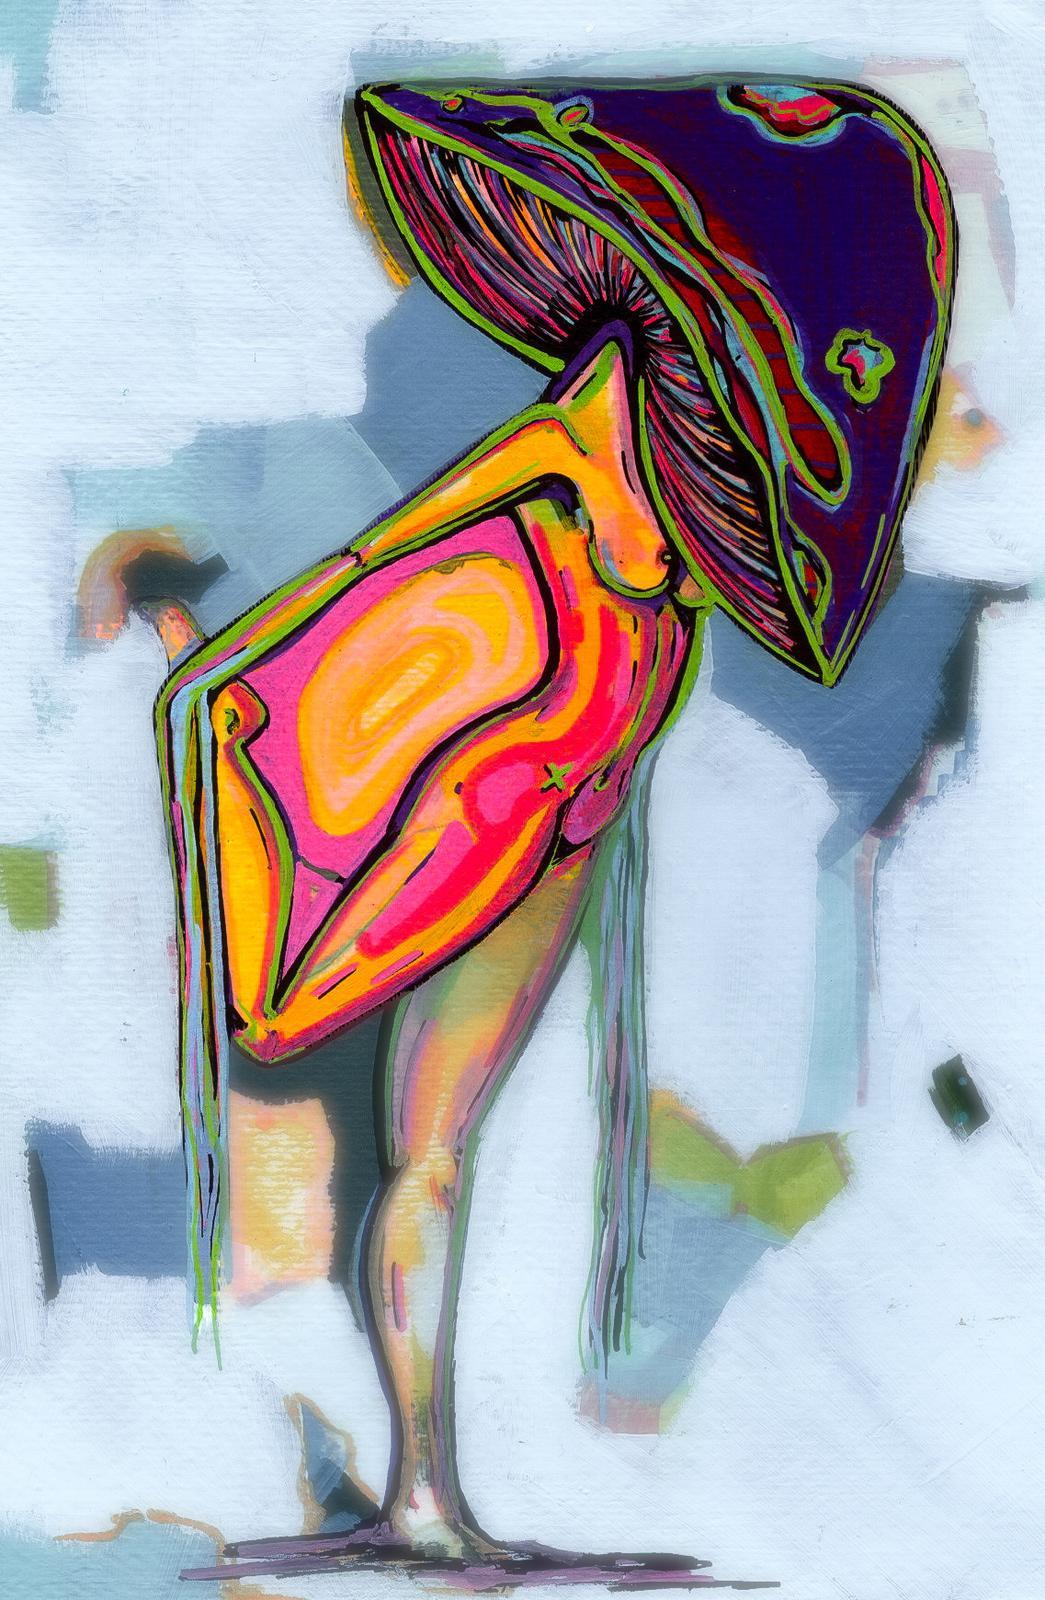 Mycology Girl - Art Print by me